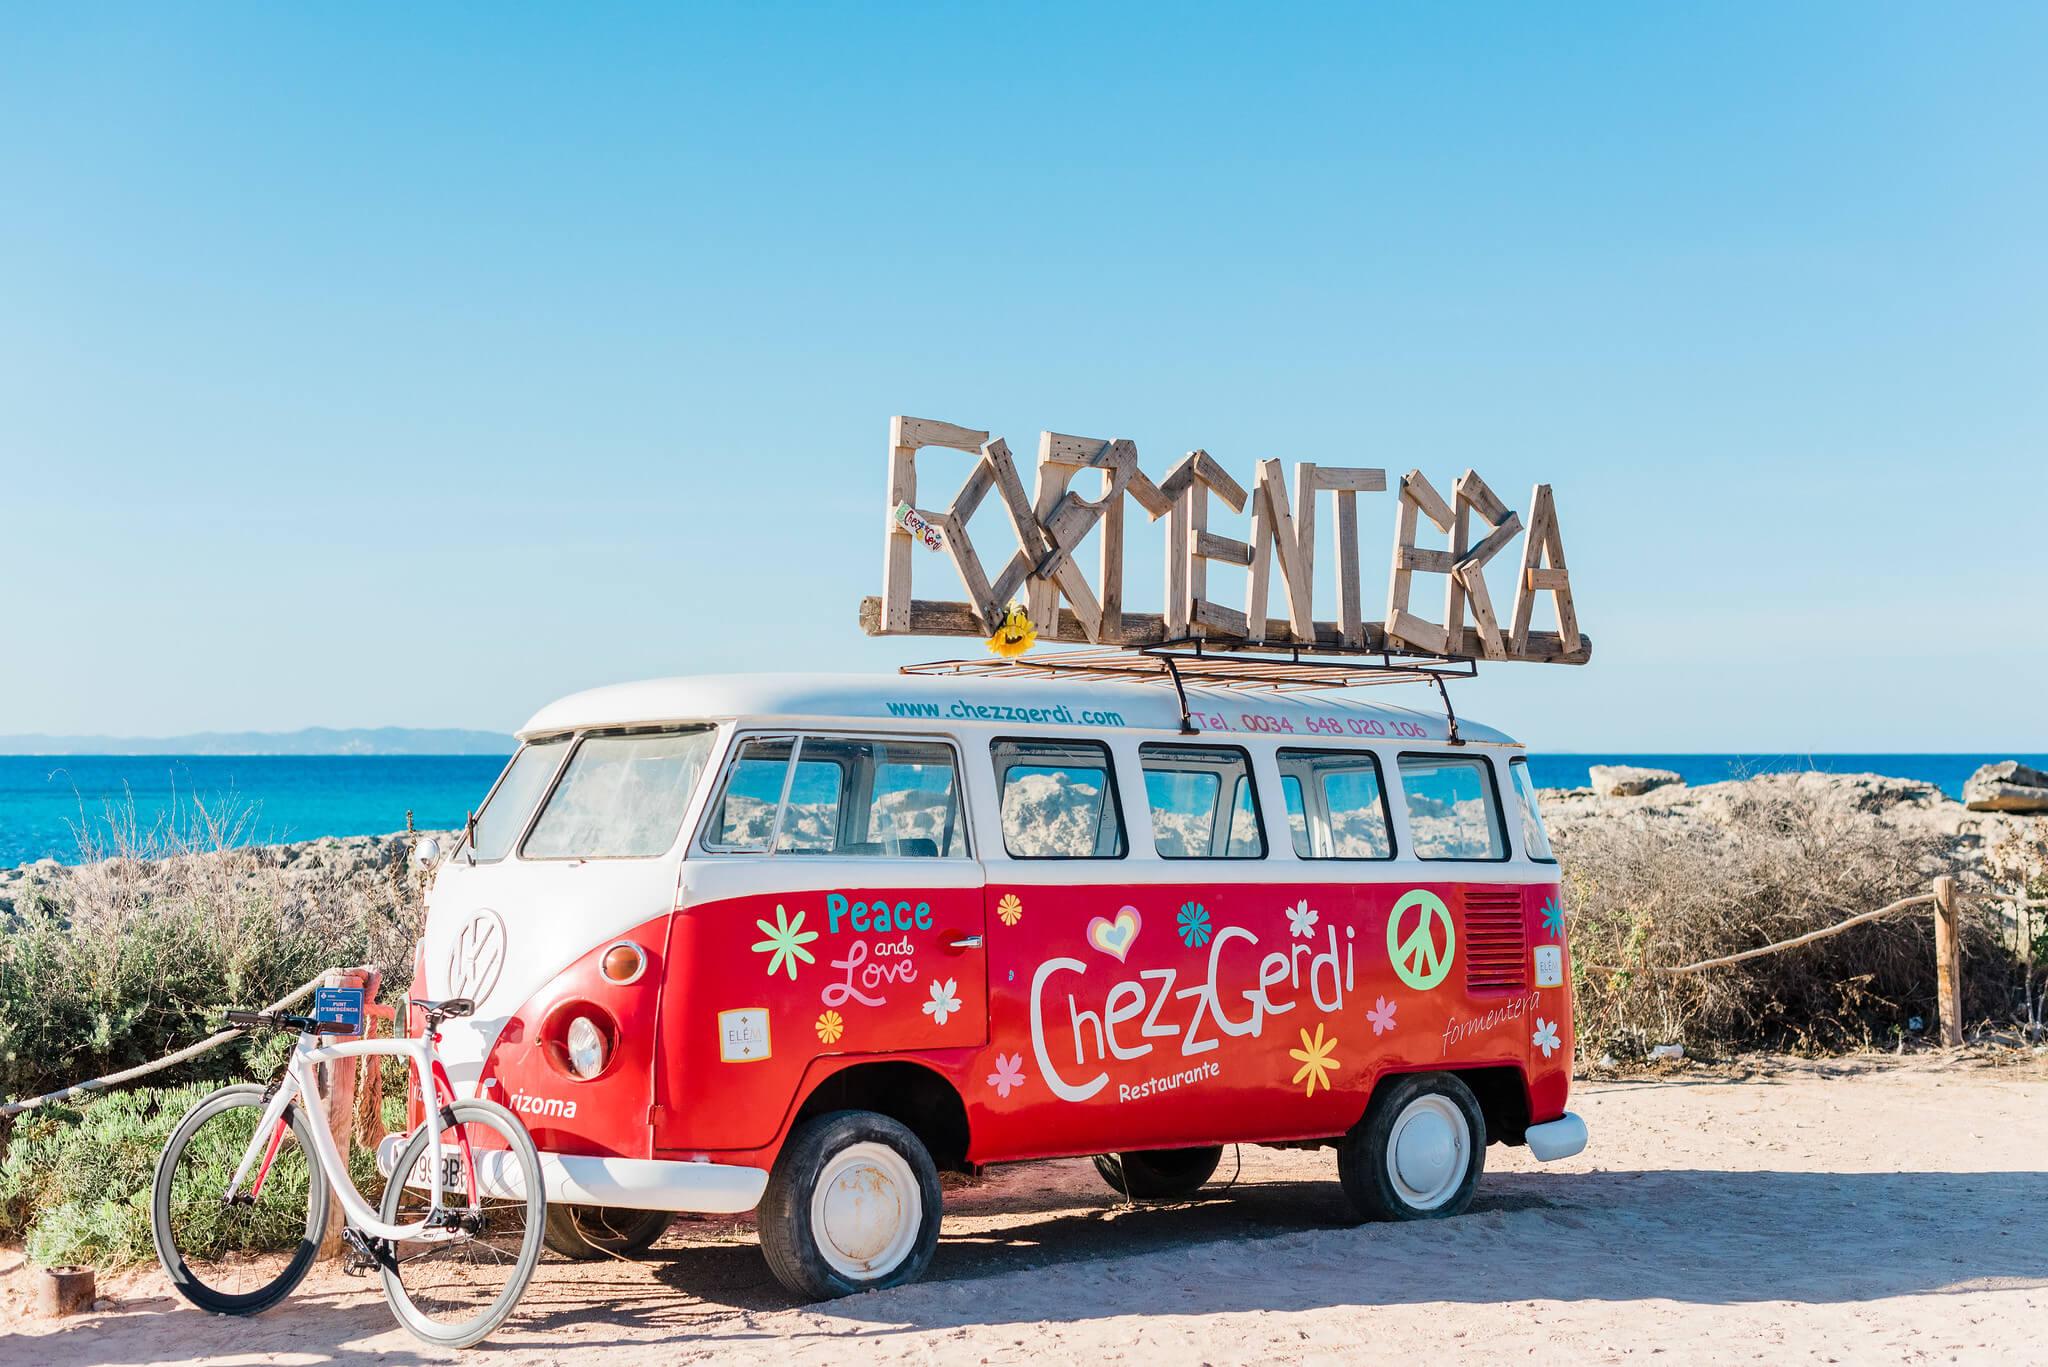 https://www.white-ibiza.com/wp-content/uploads/2020/03/formentera-beach-restaurants-chezz-gerdi-2020-10.jpg